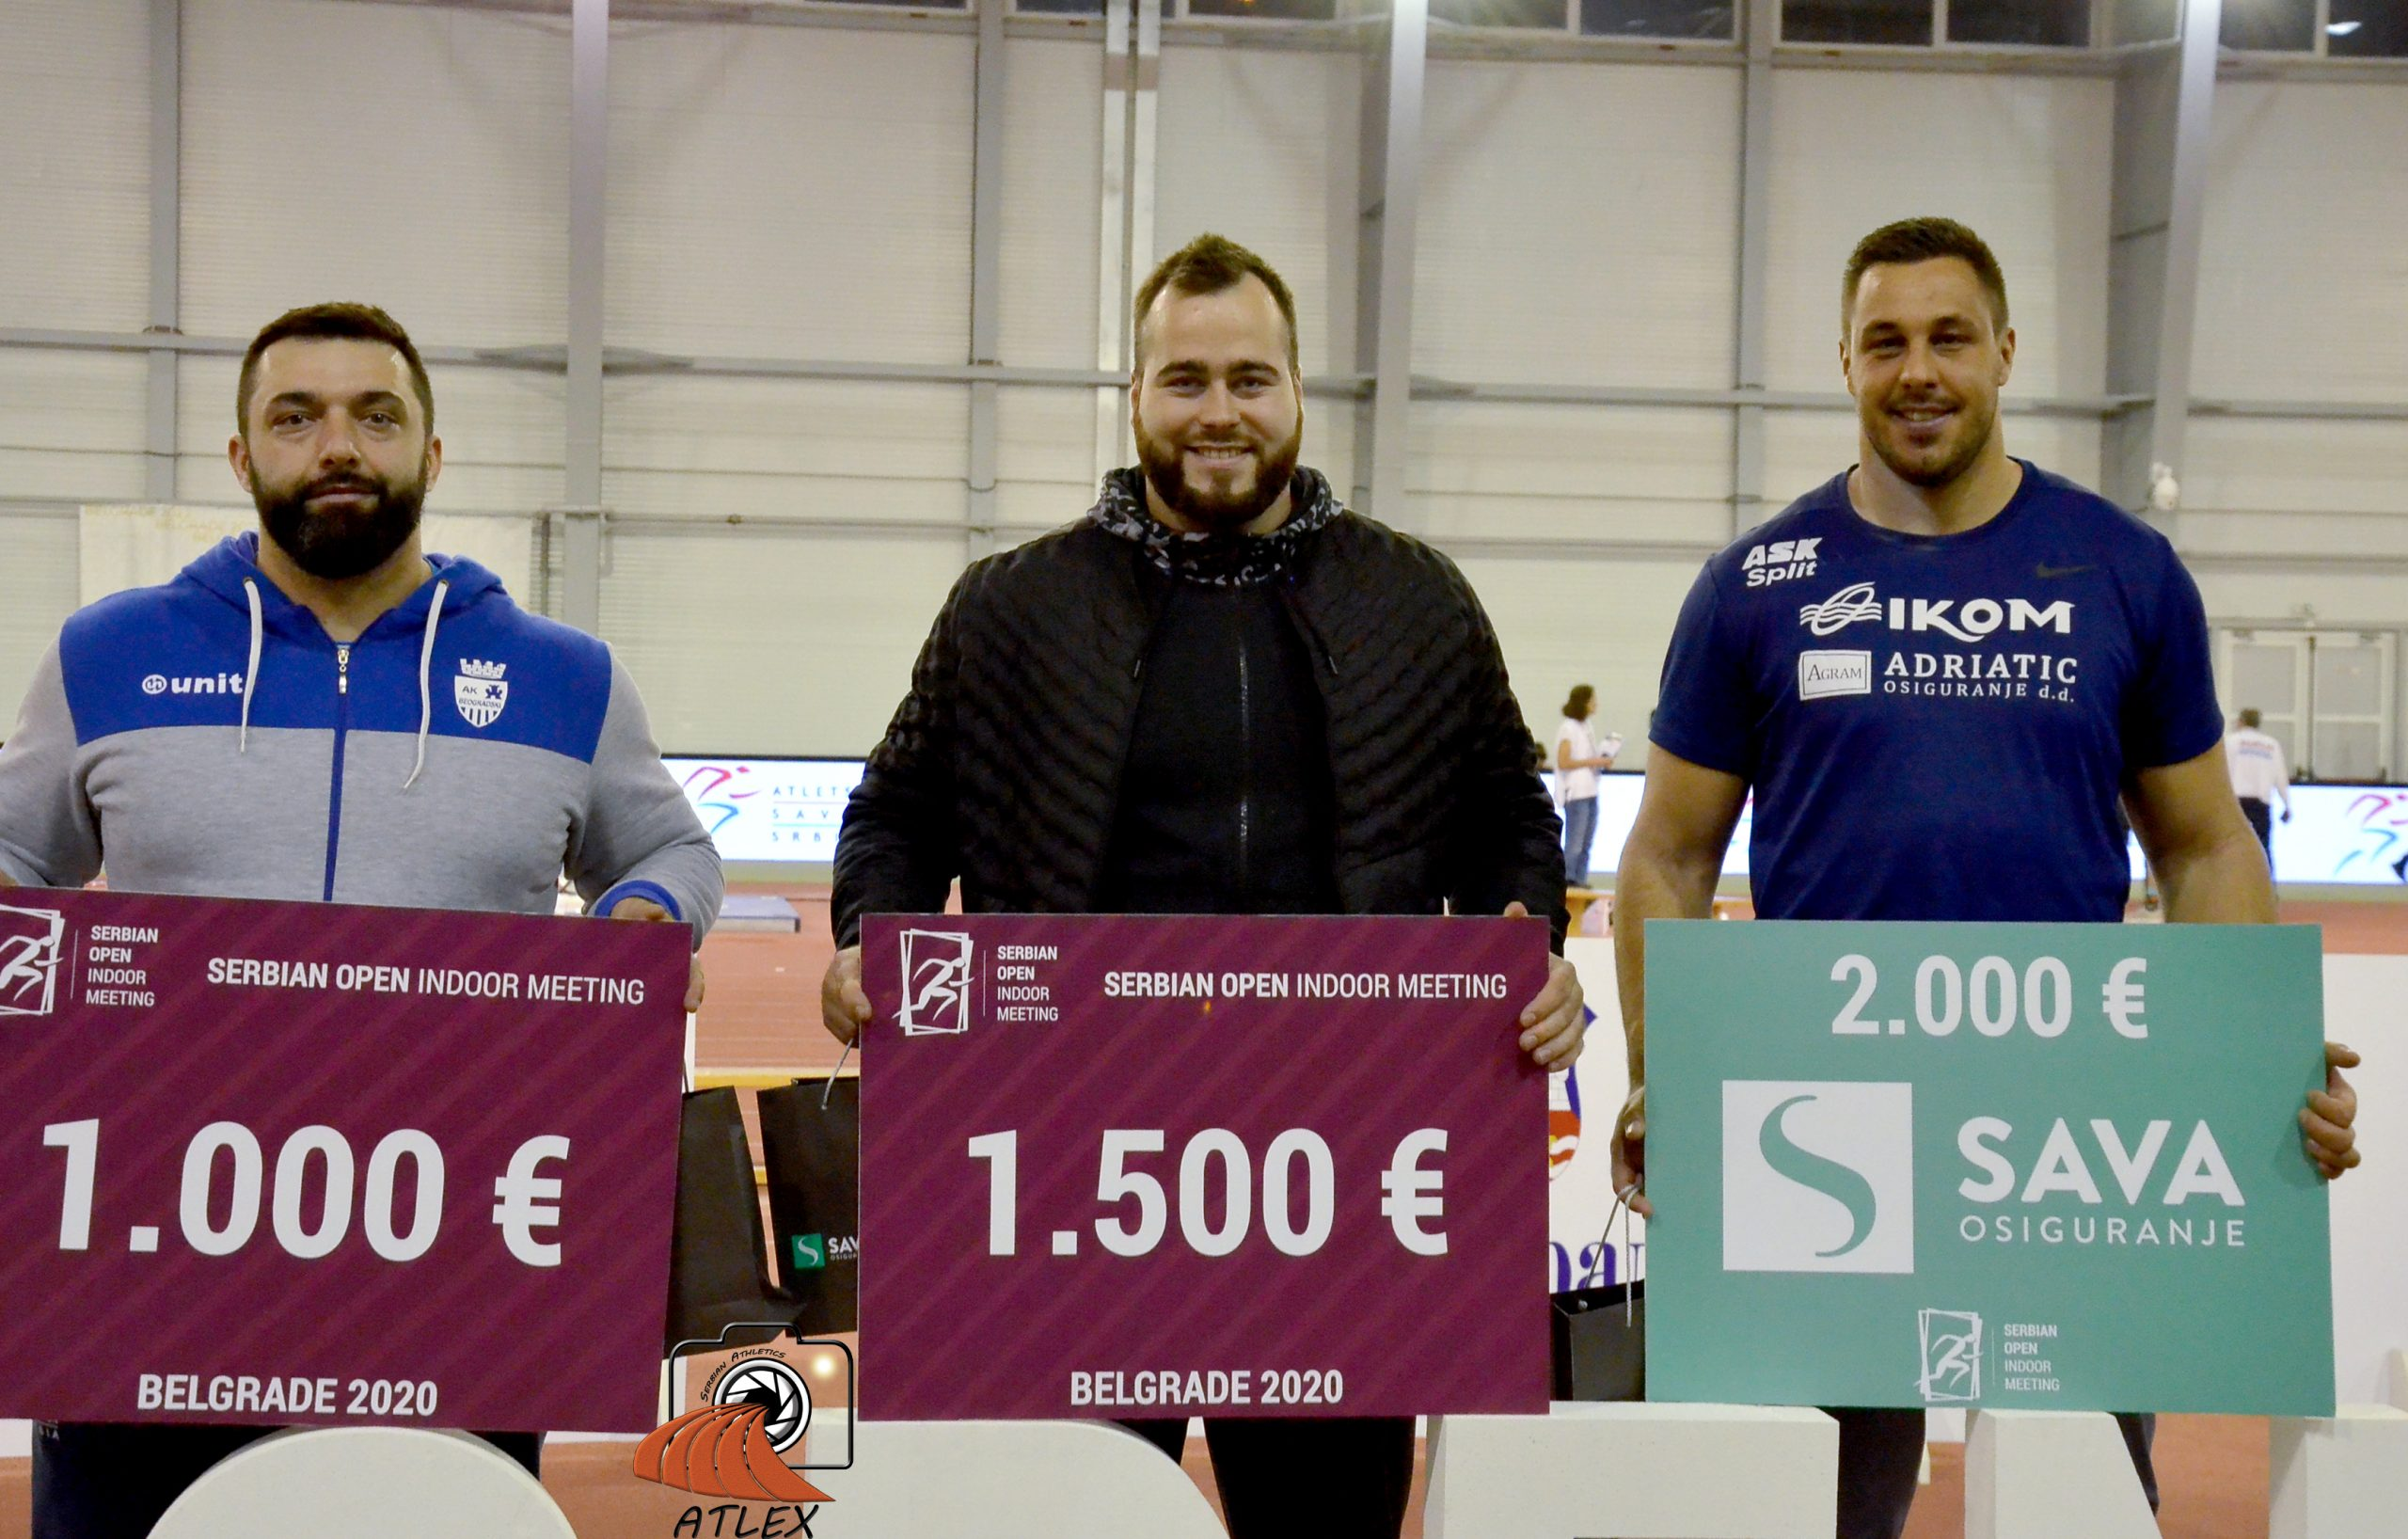 Tri najbolja atletičara na 5. Serbian Open 2020